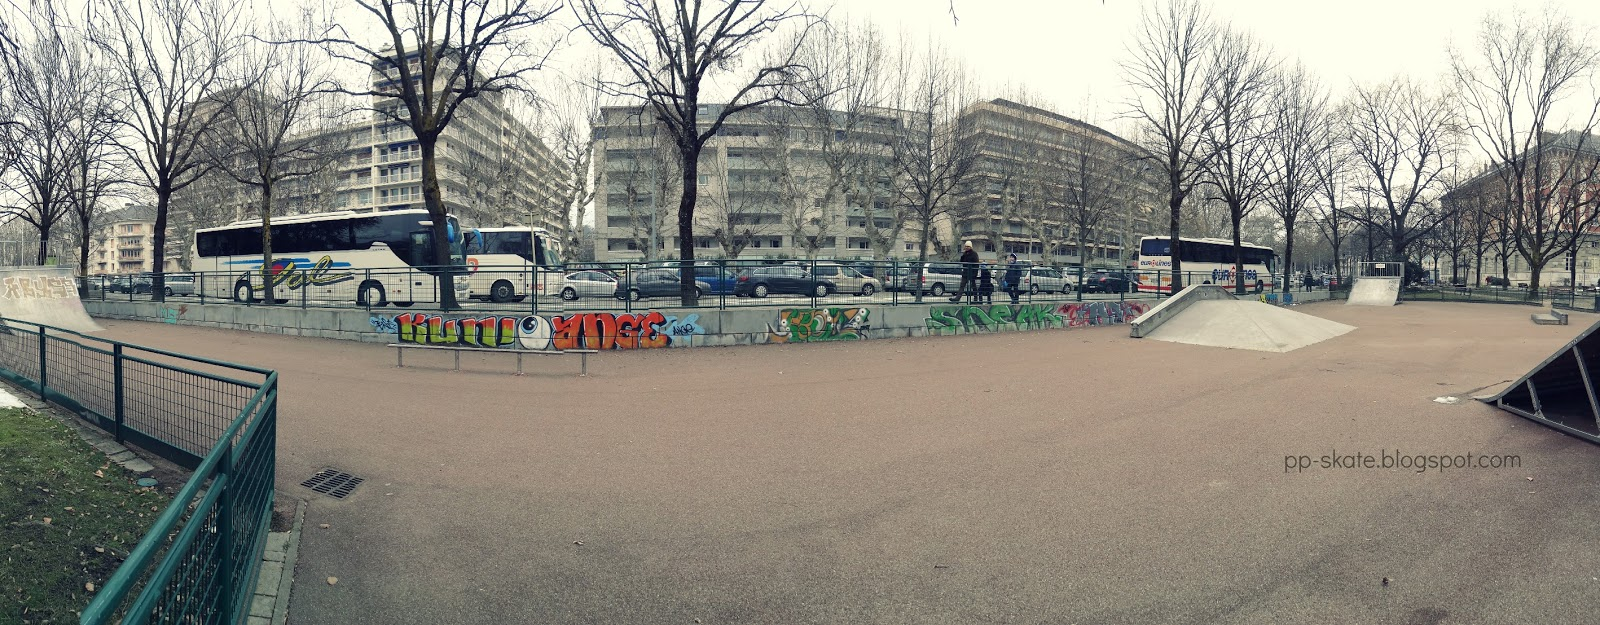 Le skatepark de chamb ry 73 jackspots - Bureau de poste chambery ...